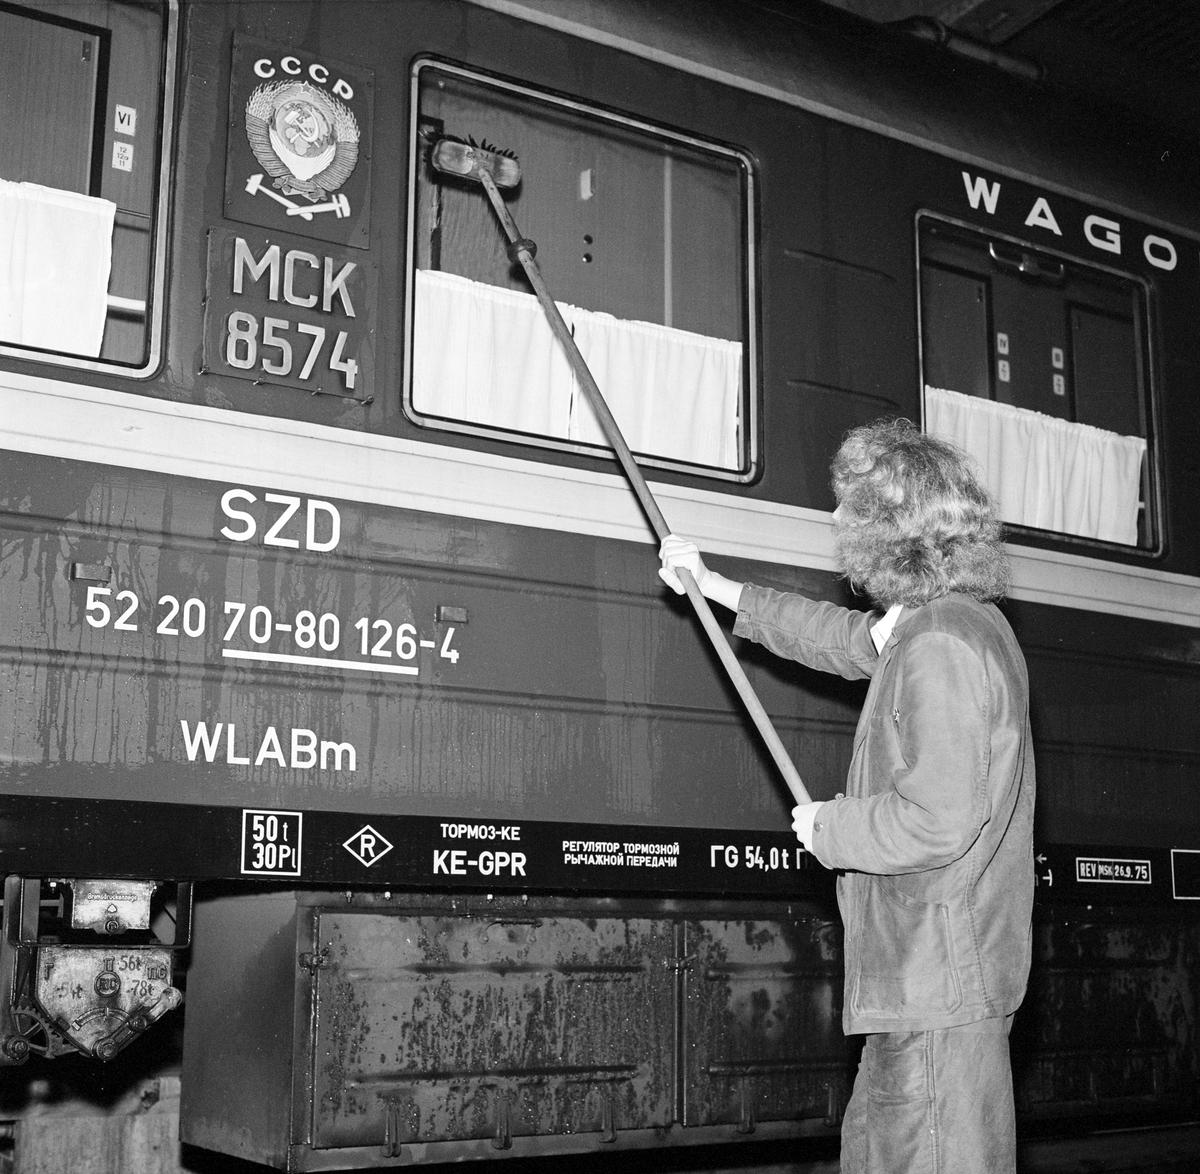 WLABm CCCP MCK 8574 Vagntvättare i Hagalund. SZD 52 20 70-80 126-4